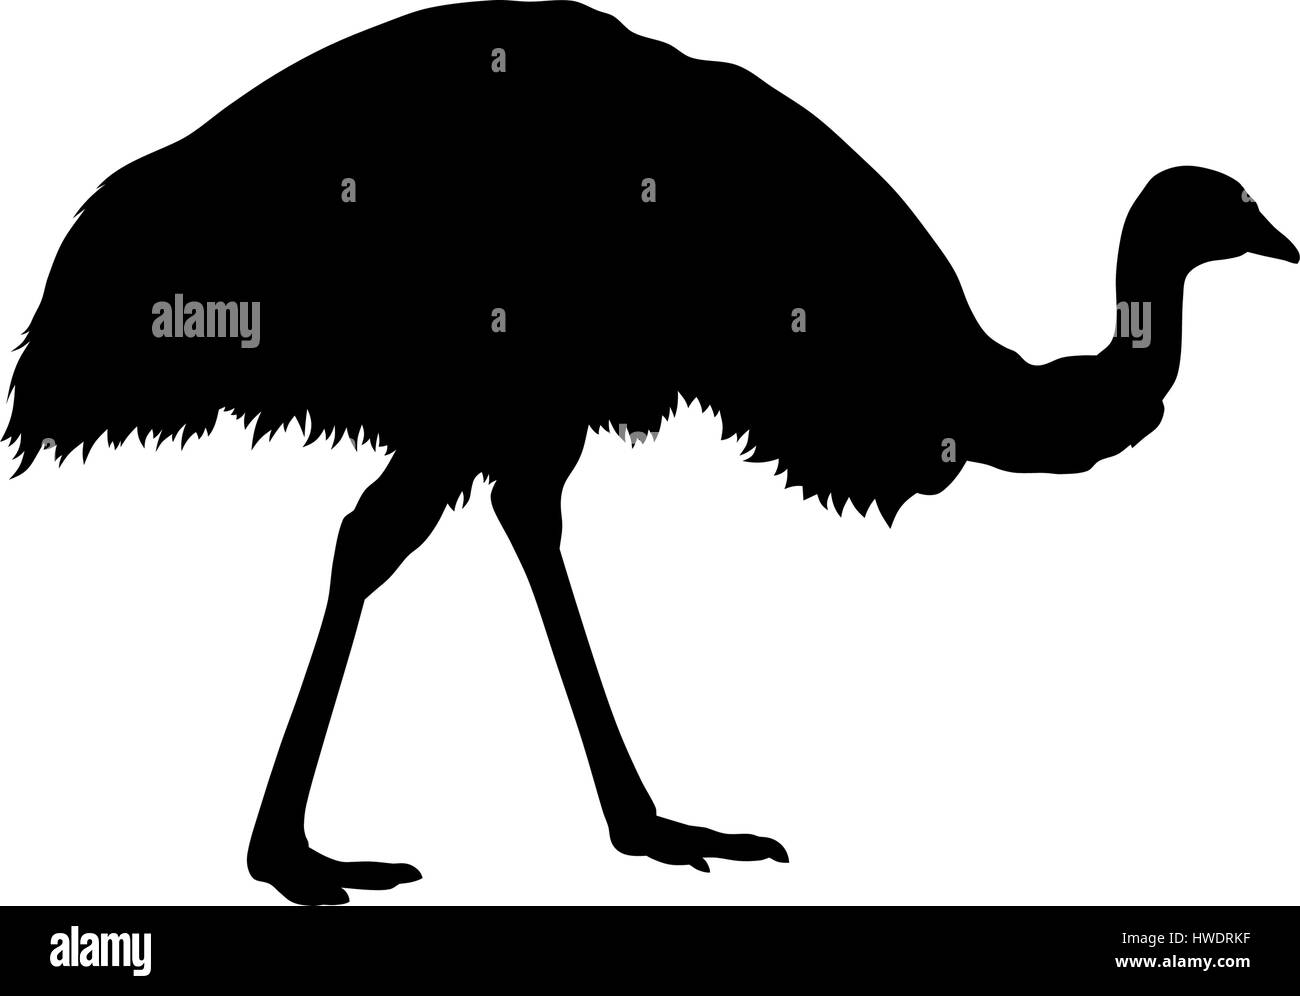 Vector illustration of emu silhouette - Stock Image